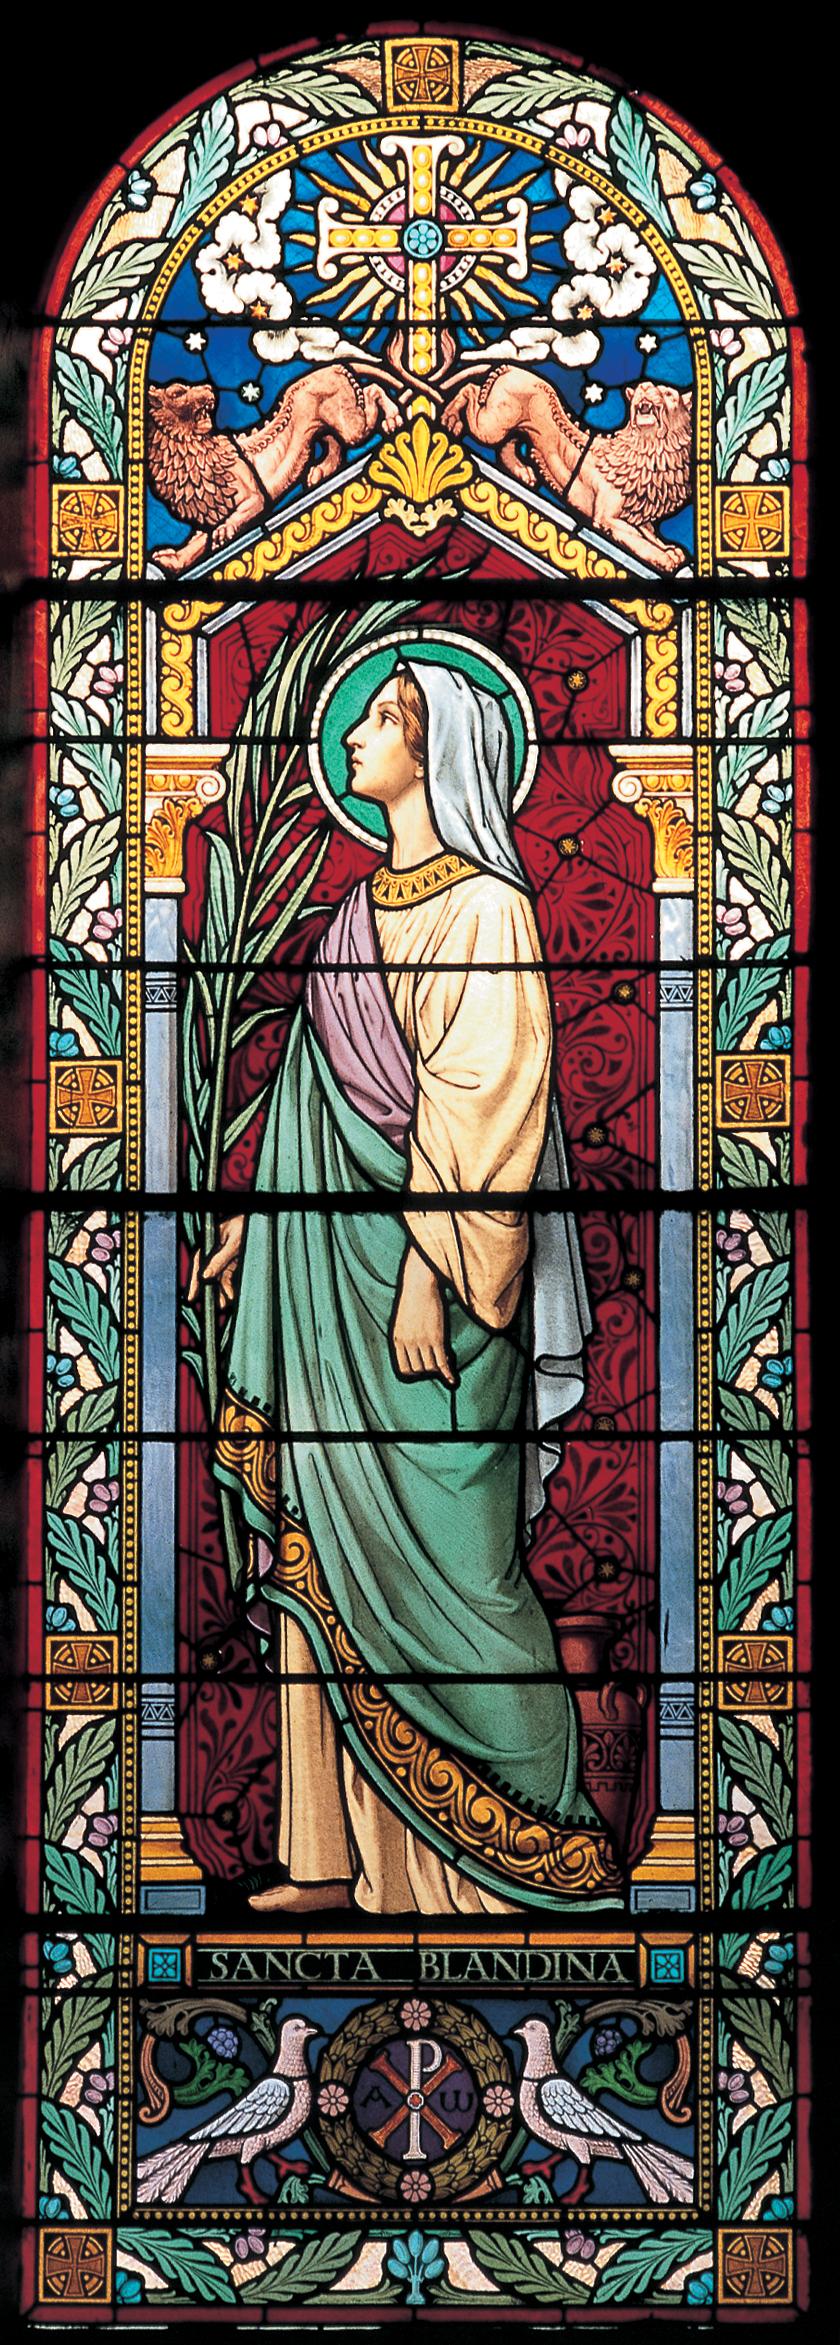 http://upload.wikimedia.org/wikipedia/commons/a/ae/Sainte_irenee_sainte_blandine.jpg